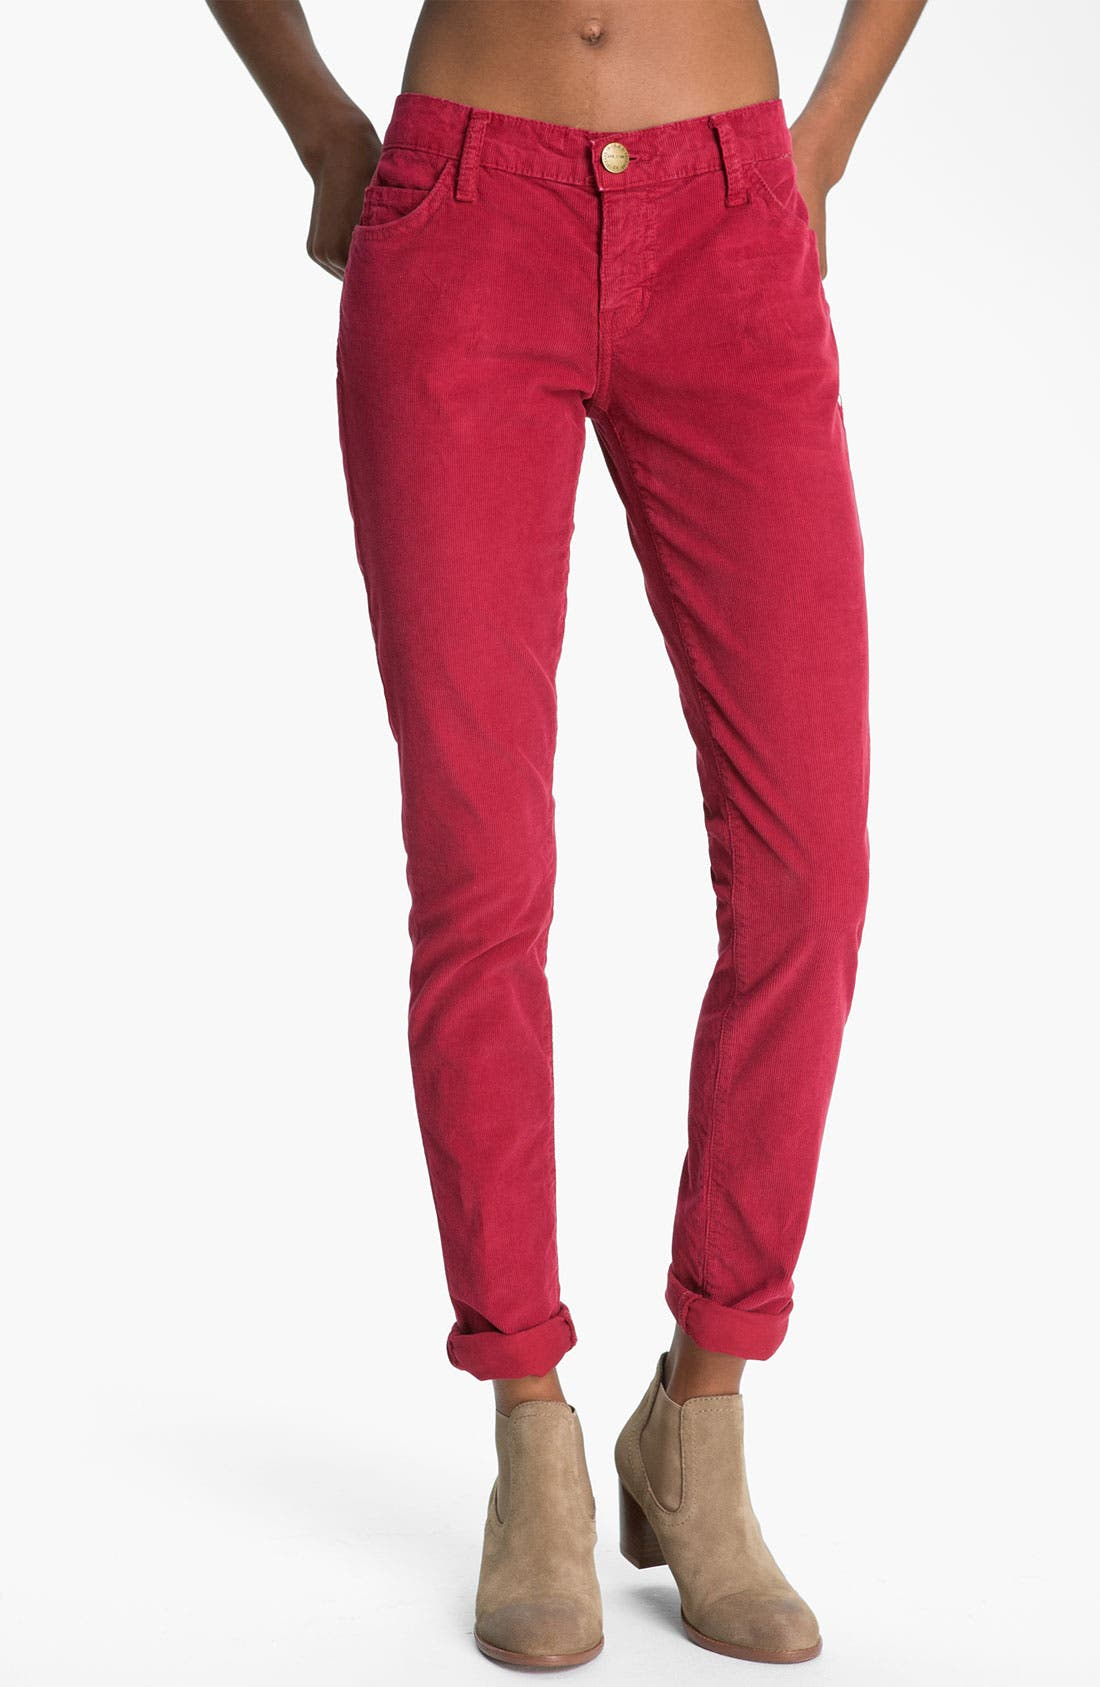 Main Image - Current/Elliott 'The Skinny' Stretch Jeans (Vintage Crimson)